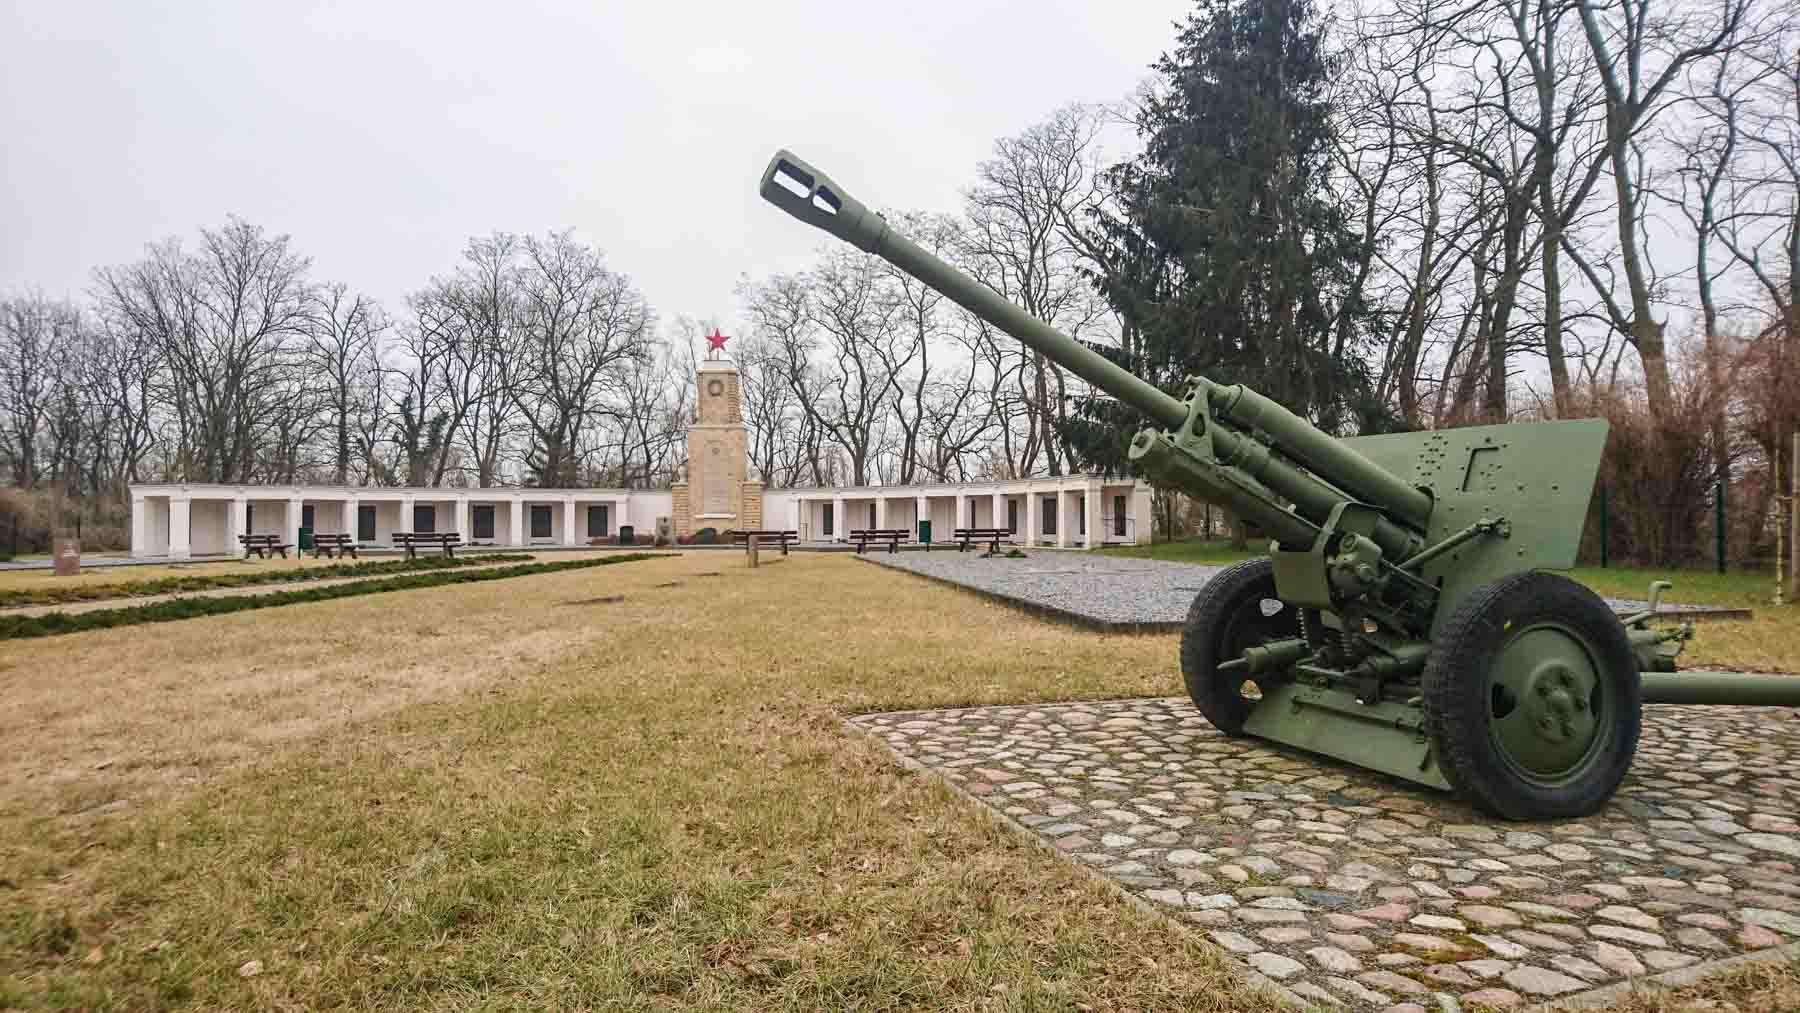 Sowjetische Kriegsgräberstätte Lebus